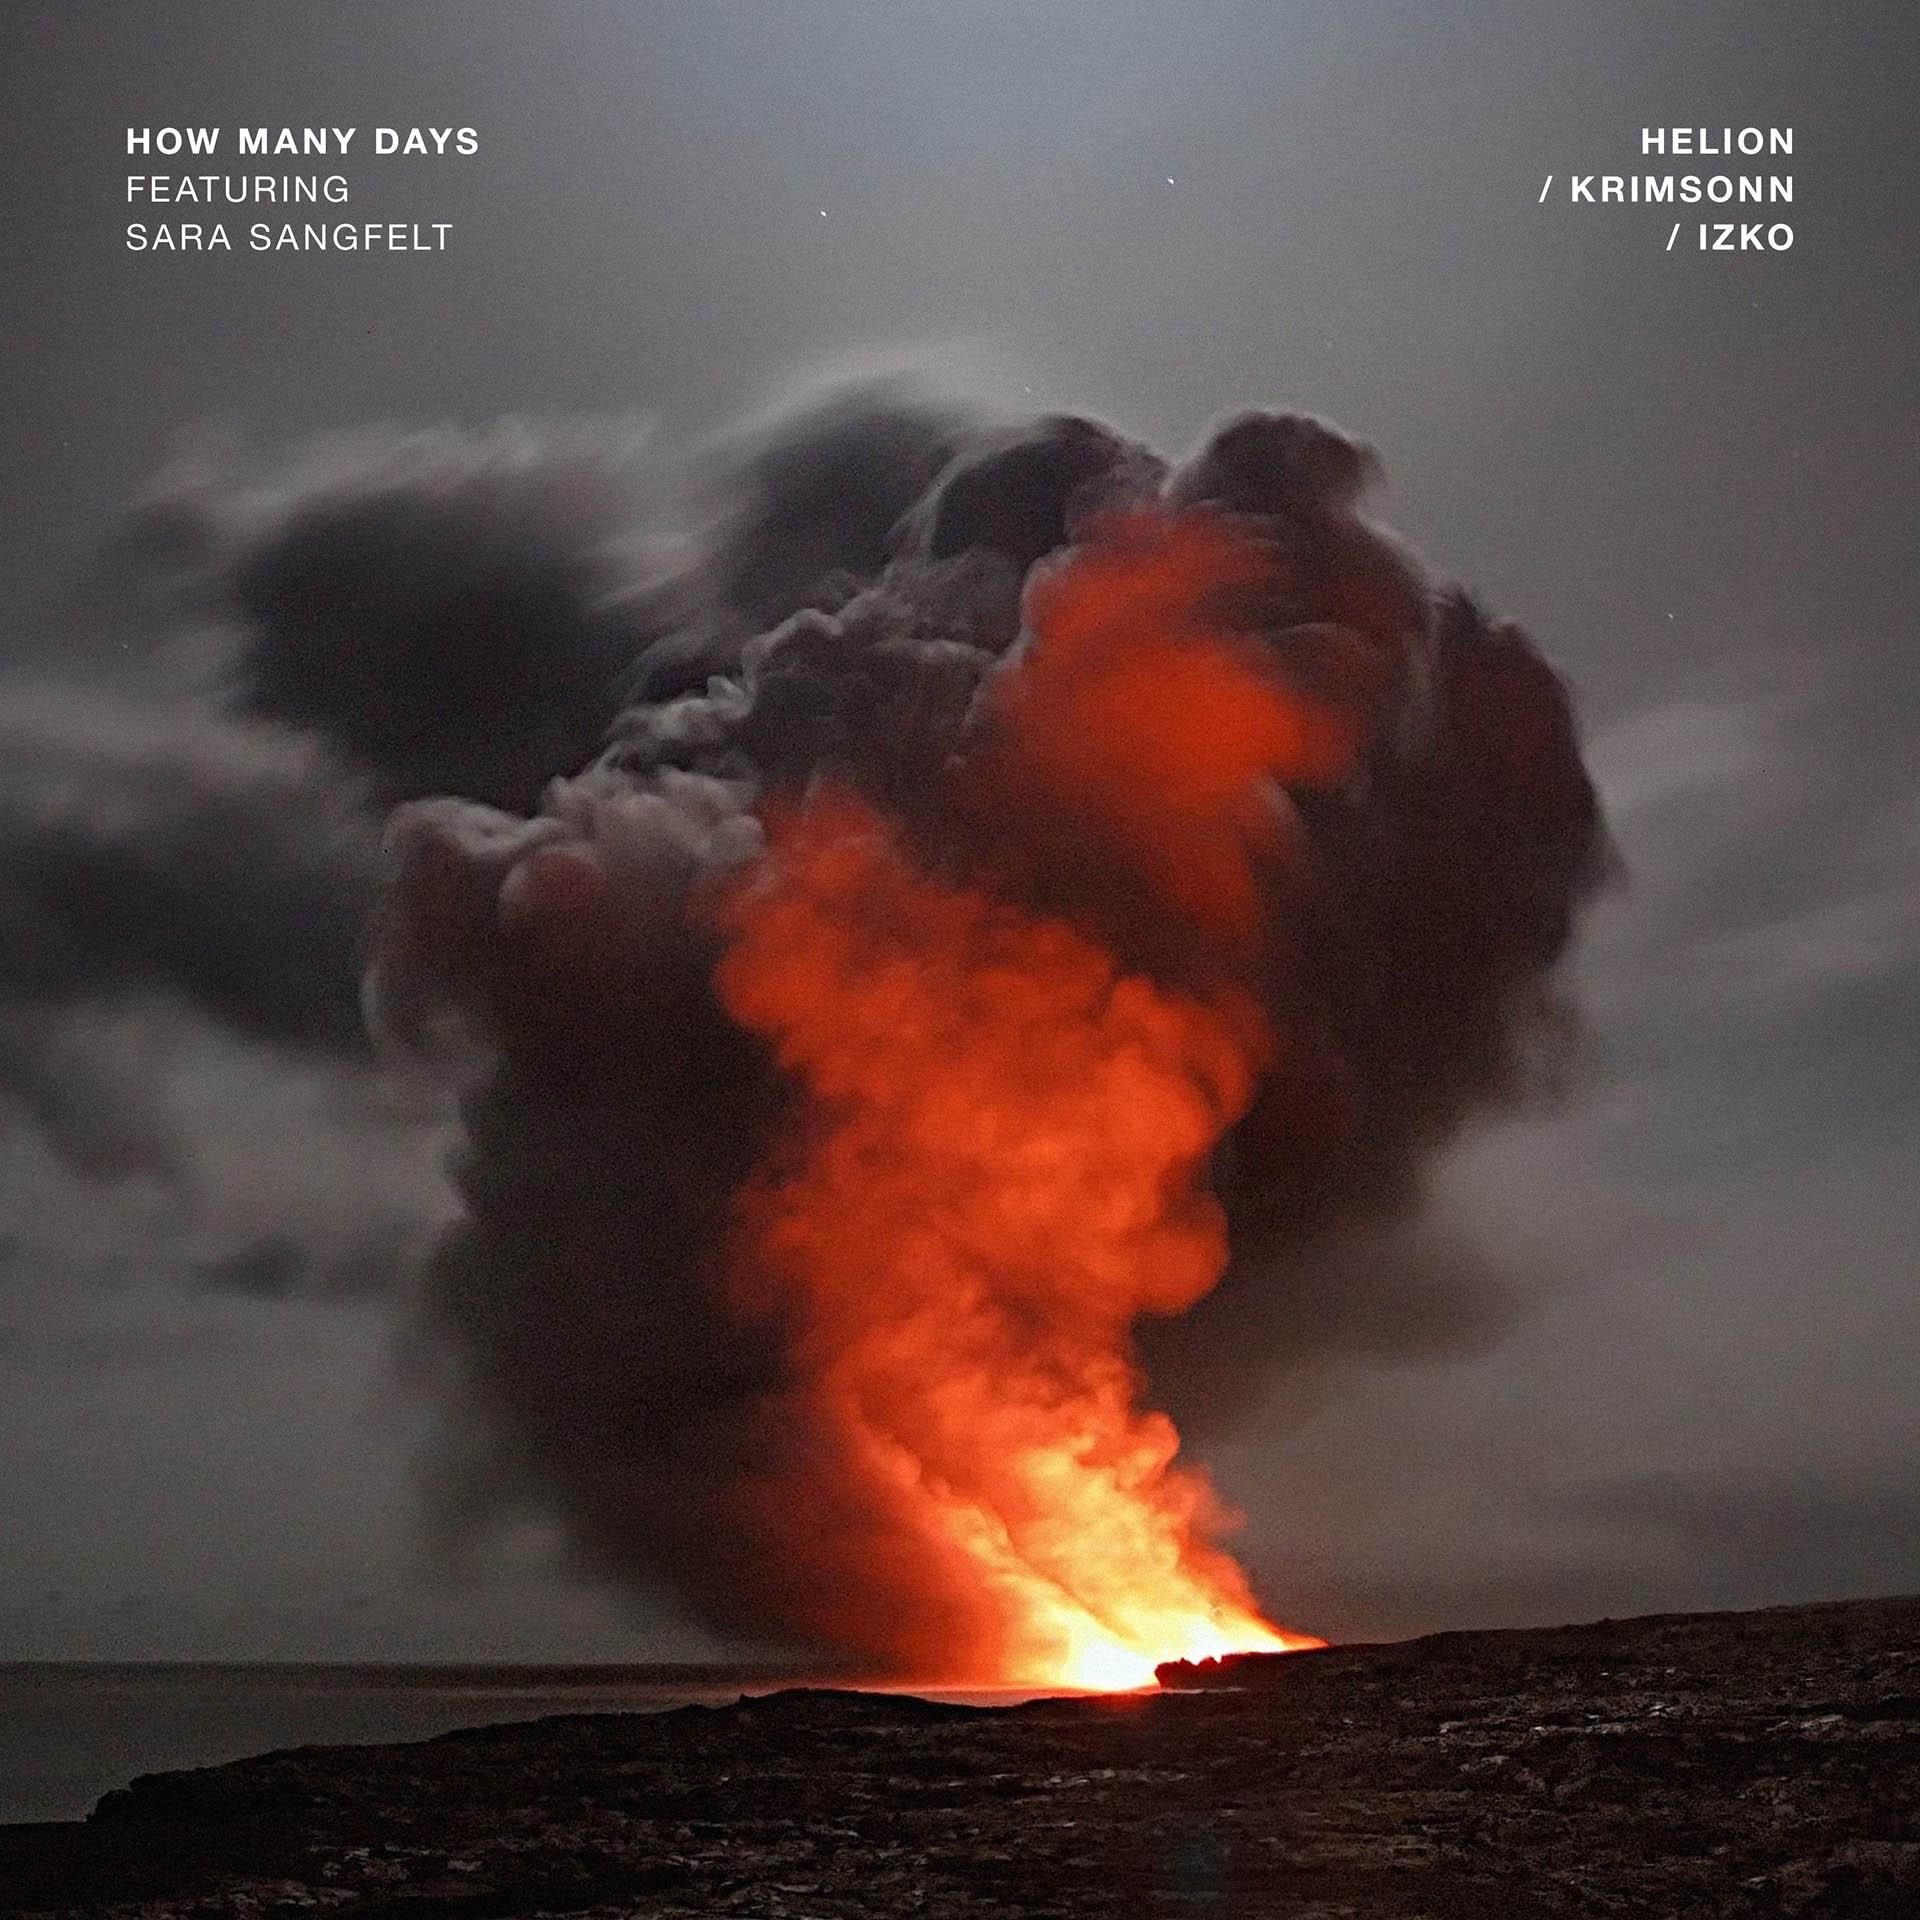 Krimsonn and IZKO for How Many Days ft. Sara Sangfelt